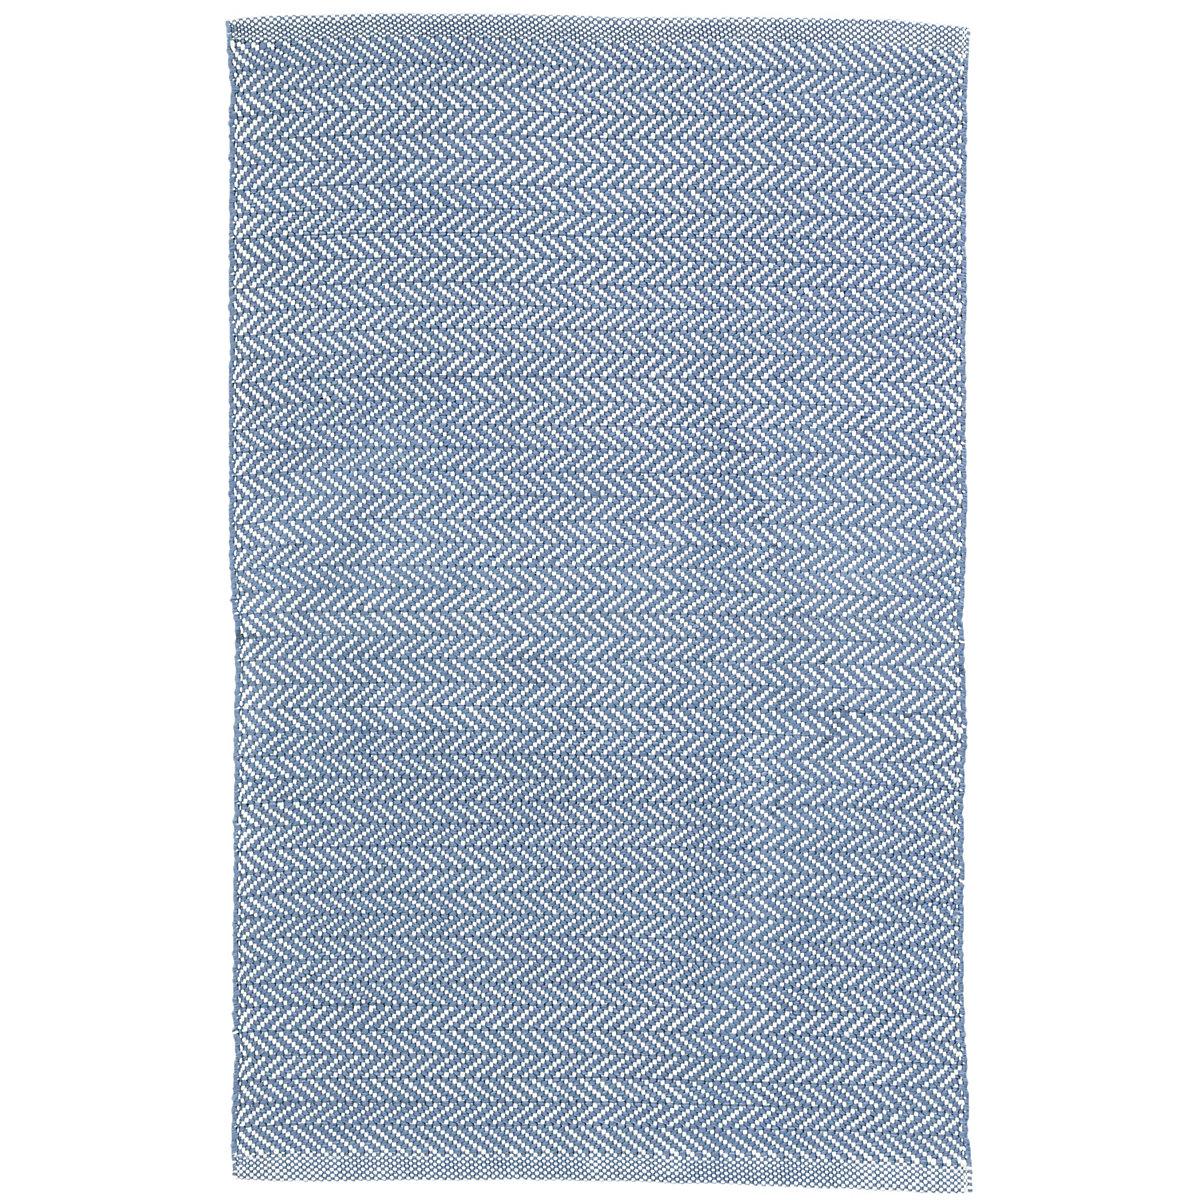 herringbone indoor rug outdoor display weaver for home rugs destined products green navy